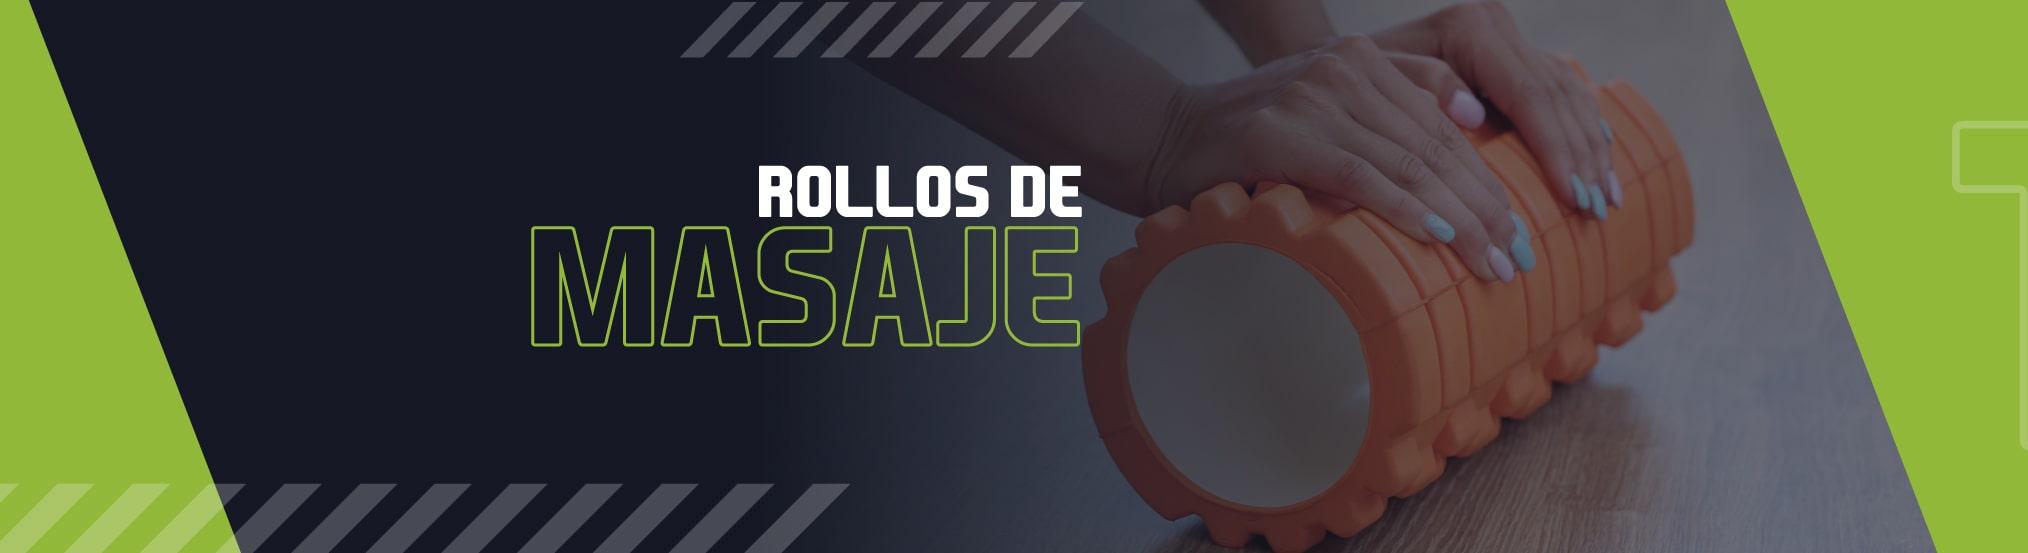 B-ROLLOS-MASAJE-DESK-min